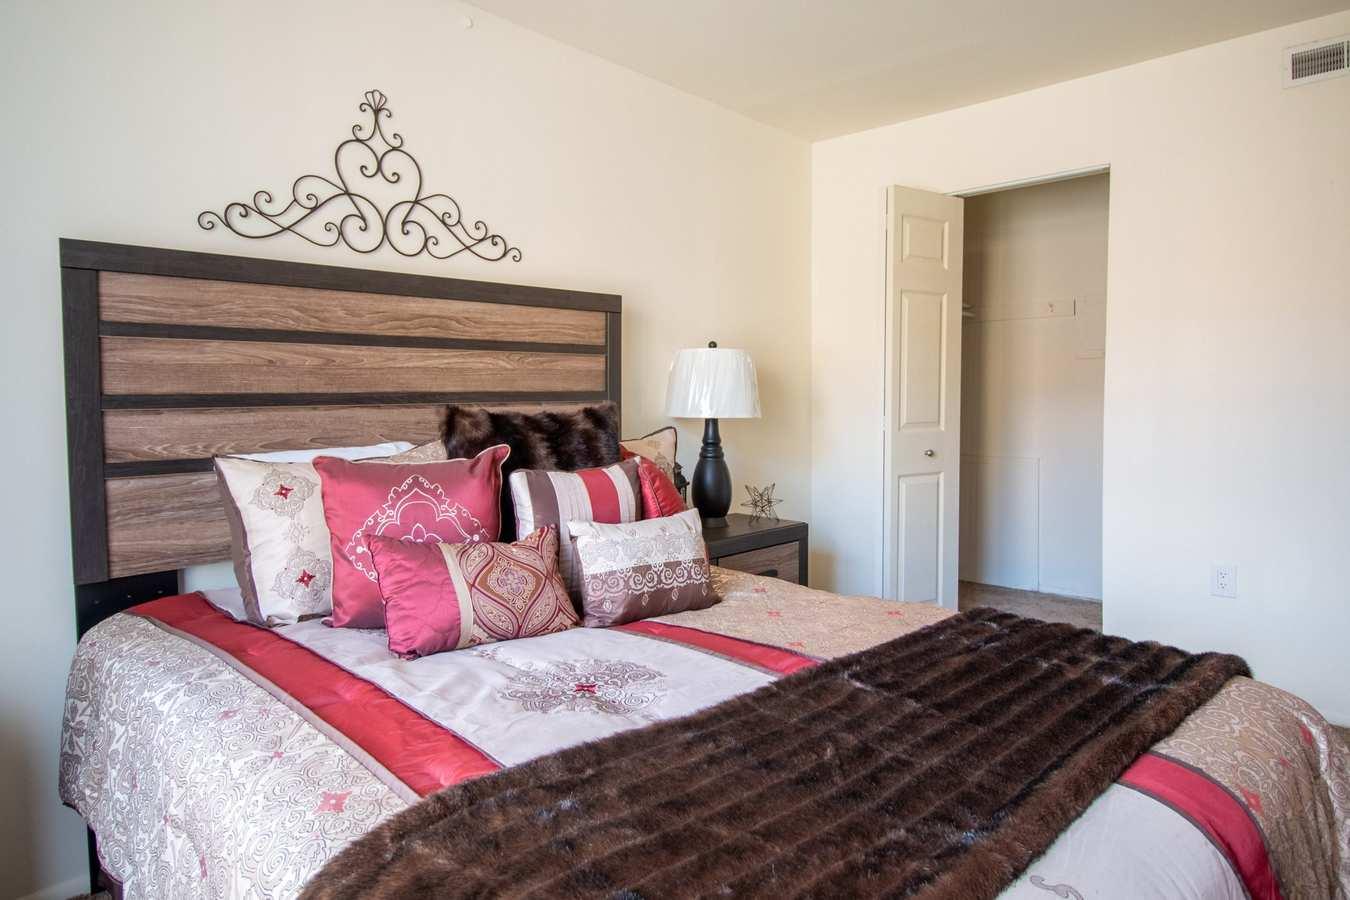 Model bedroom at Mill Village in Millville, New Jersey